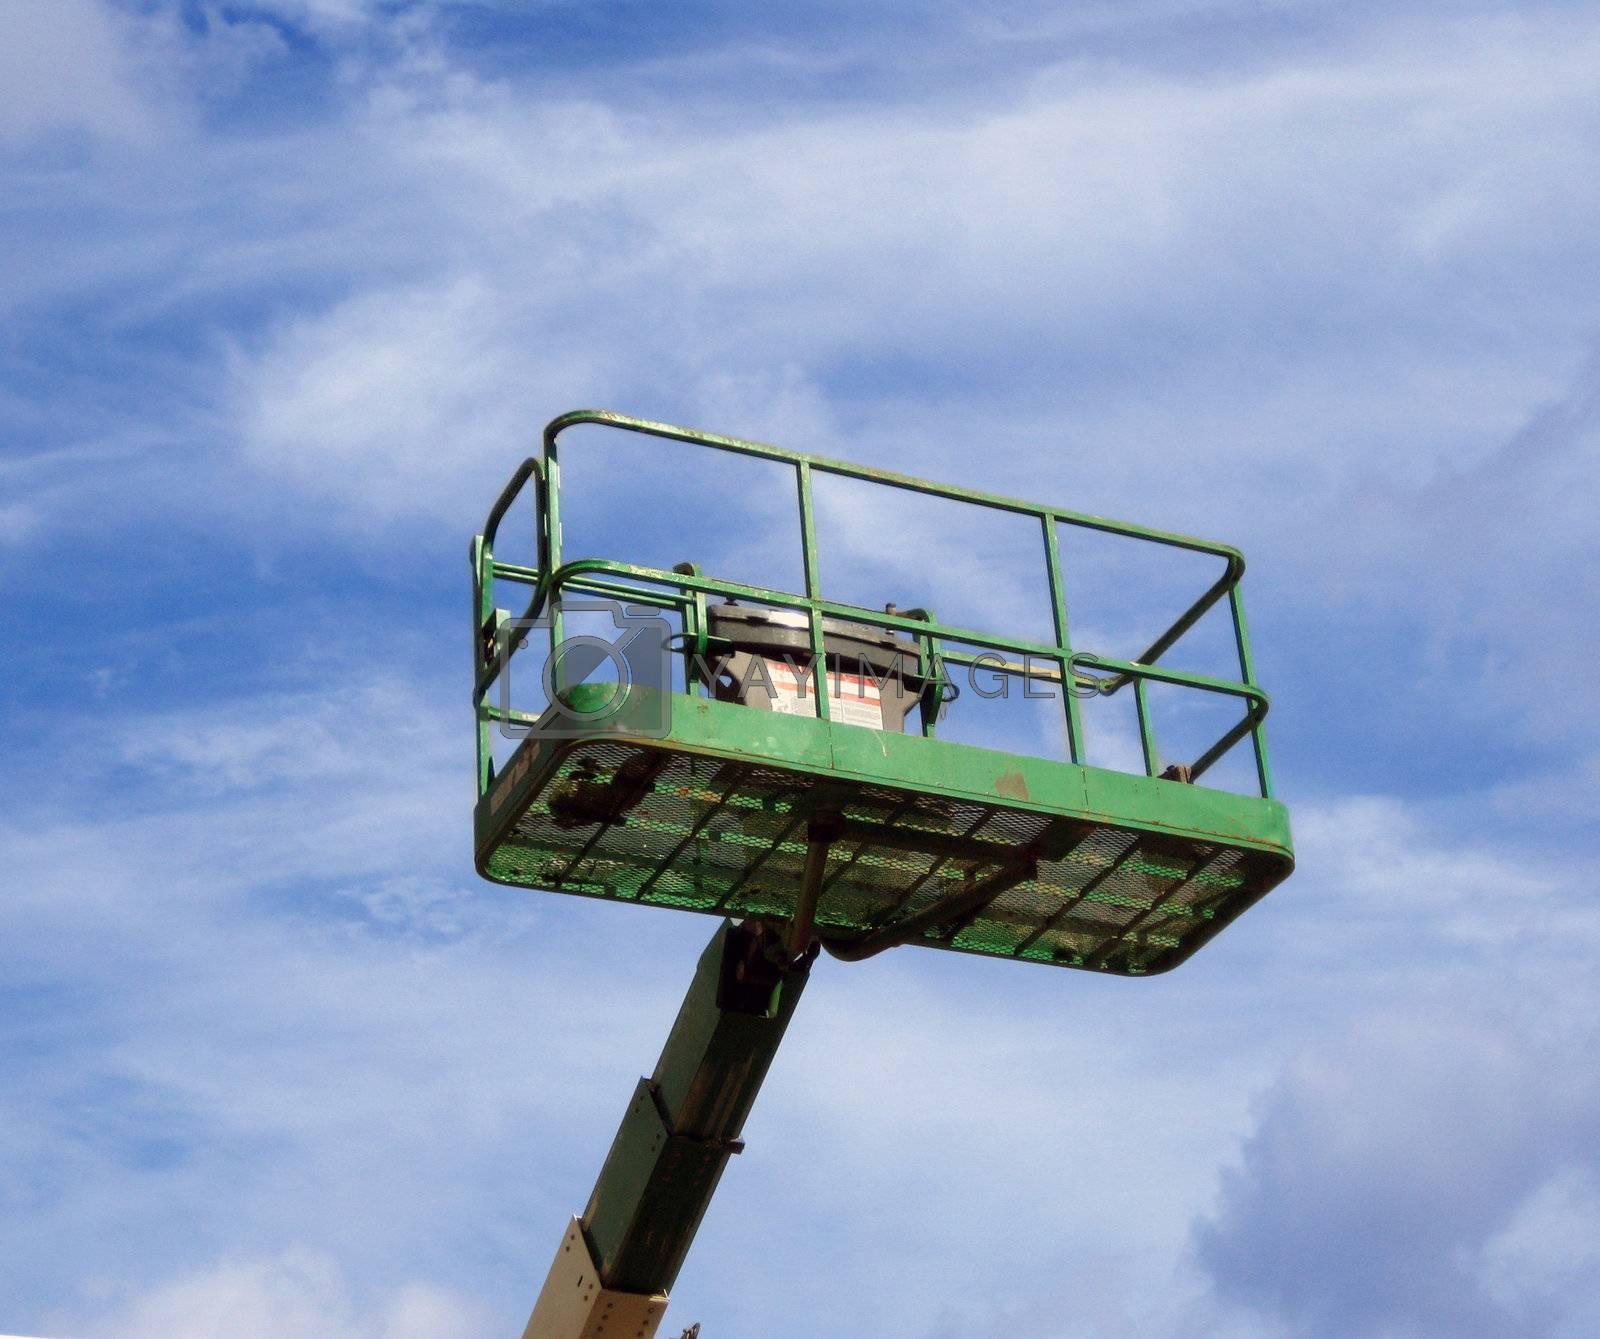 Green Mechanical Lift by jclardy